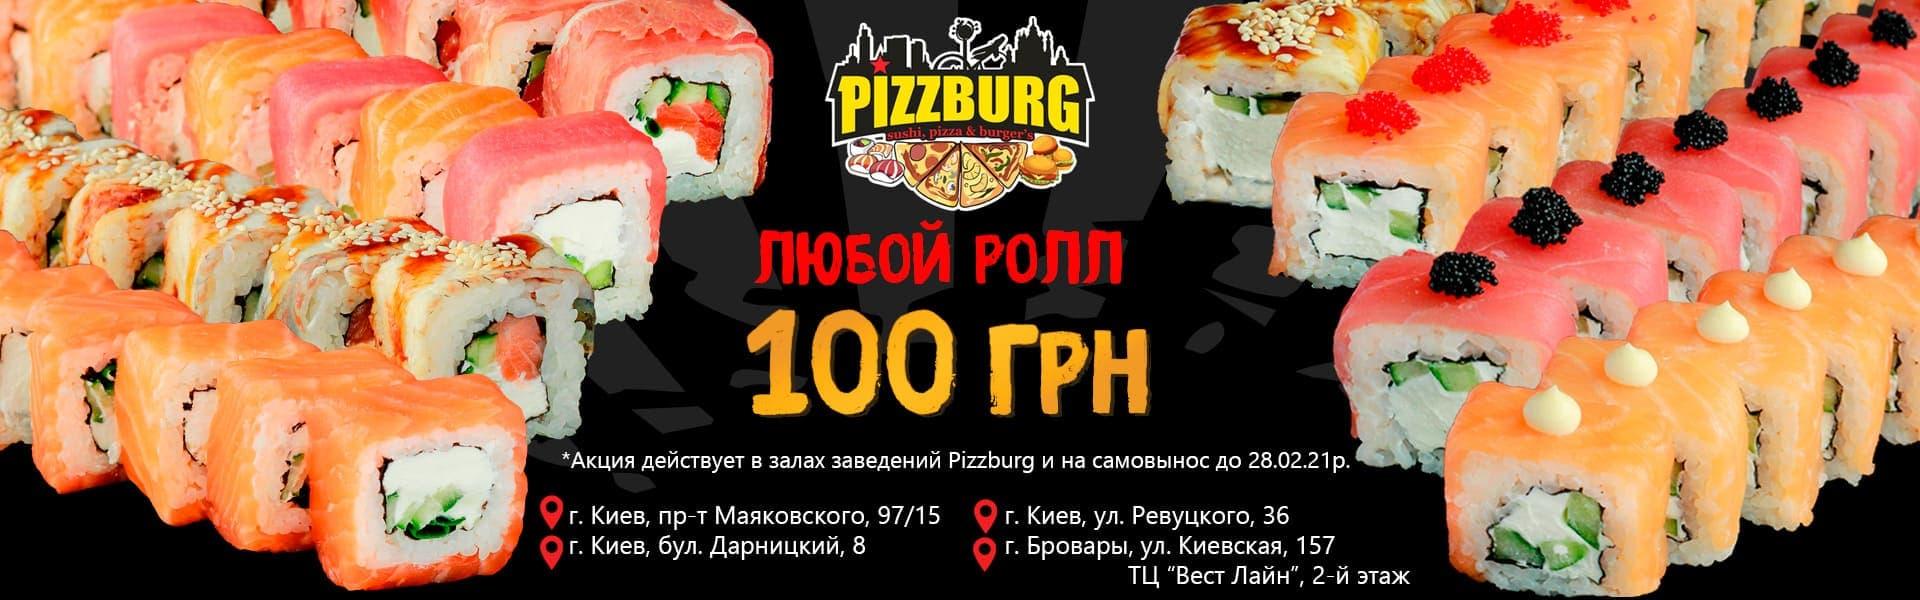 Фото - Акция - Все роллы по 100 грн! - Пиццбург